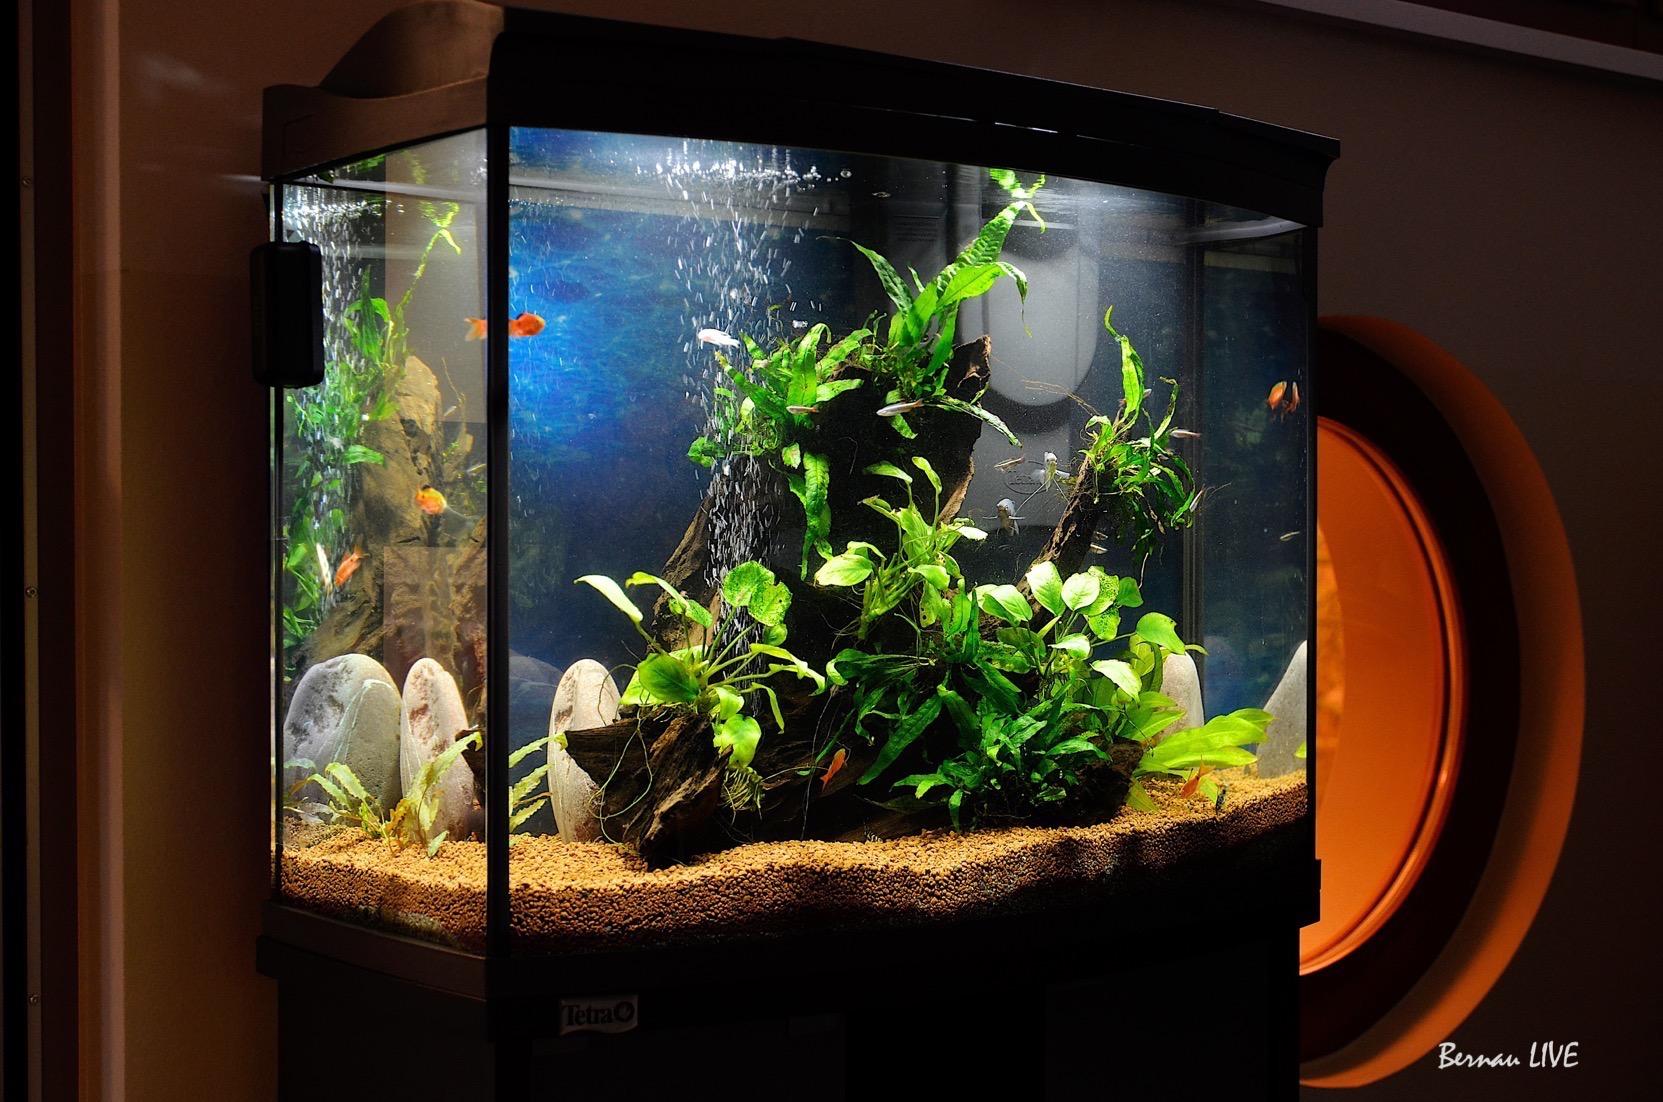 wasserwelten in bernau montessori kindergarten erhielt aquarium bernau live. Black Bedroom Furniture Sets. Home Design Ideas